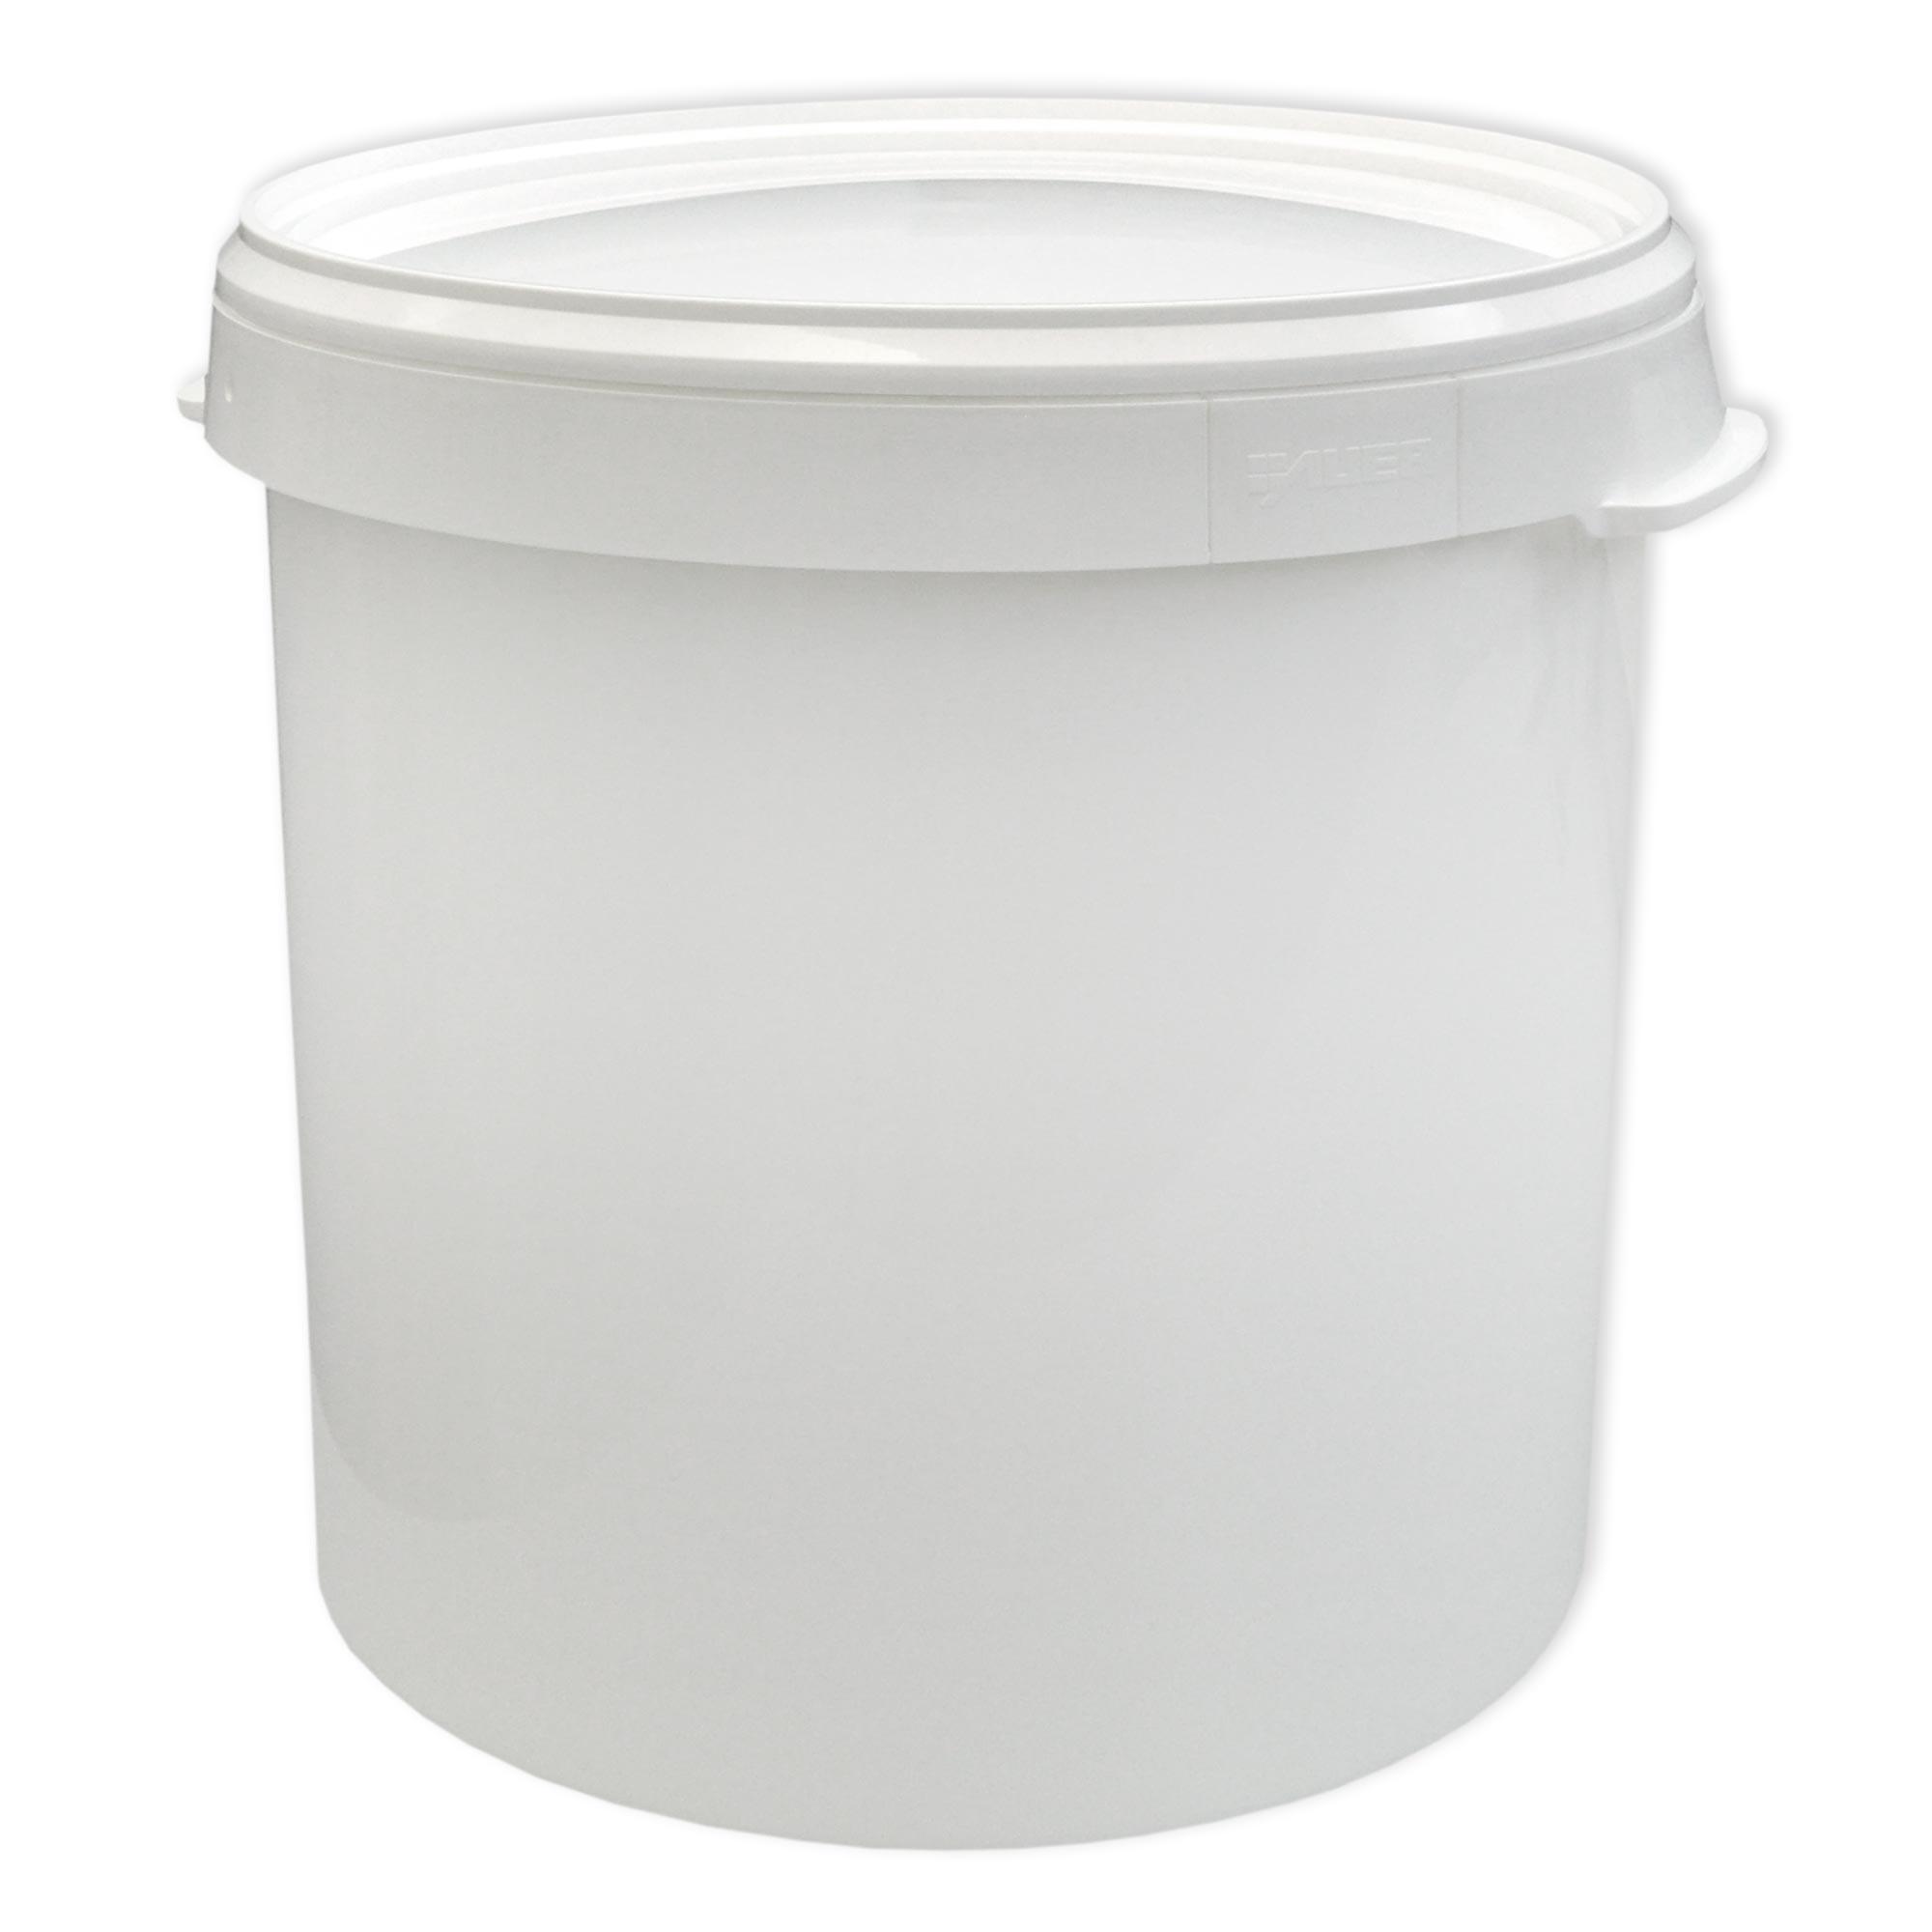 eimer mit deckel 5 10 20 30 liter hobbock plastikeimer lebensmittelecht neuware ebay. Black Bedroom Furniture Sets. Home Design Ideas